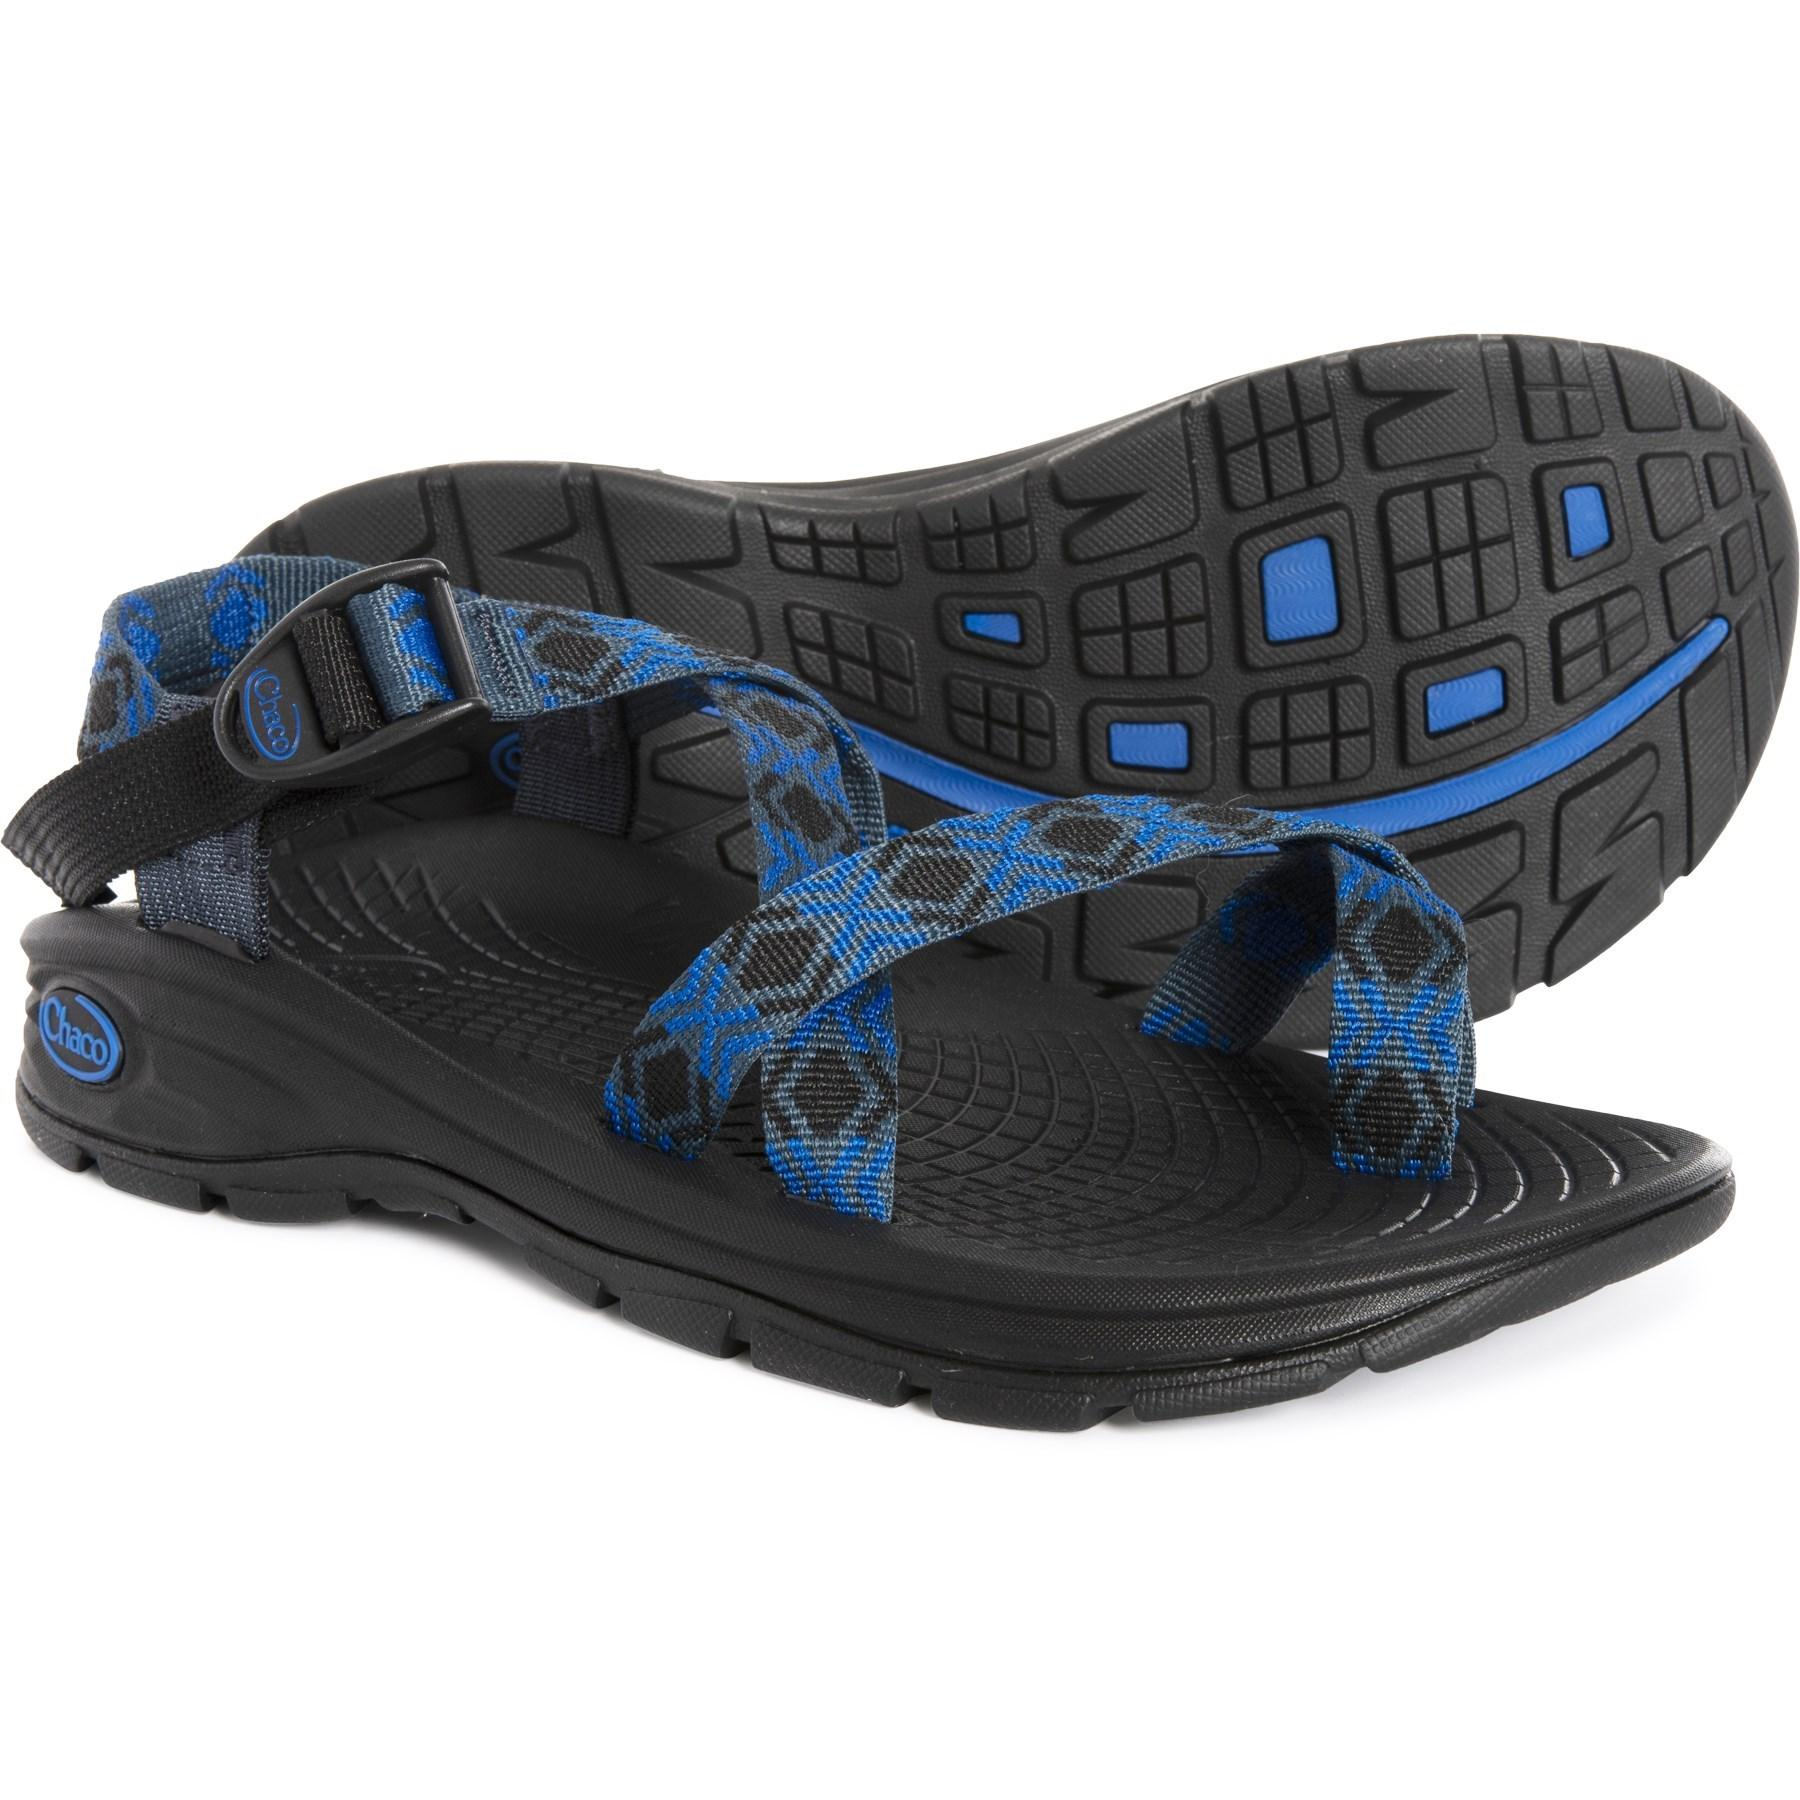 c035759d42ea Lyst - Chaco Z volv 2 Sport Sandals (for Men) in Blue for Men